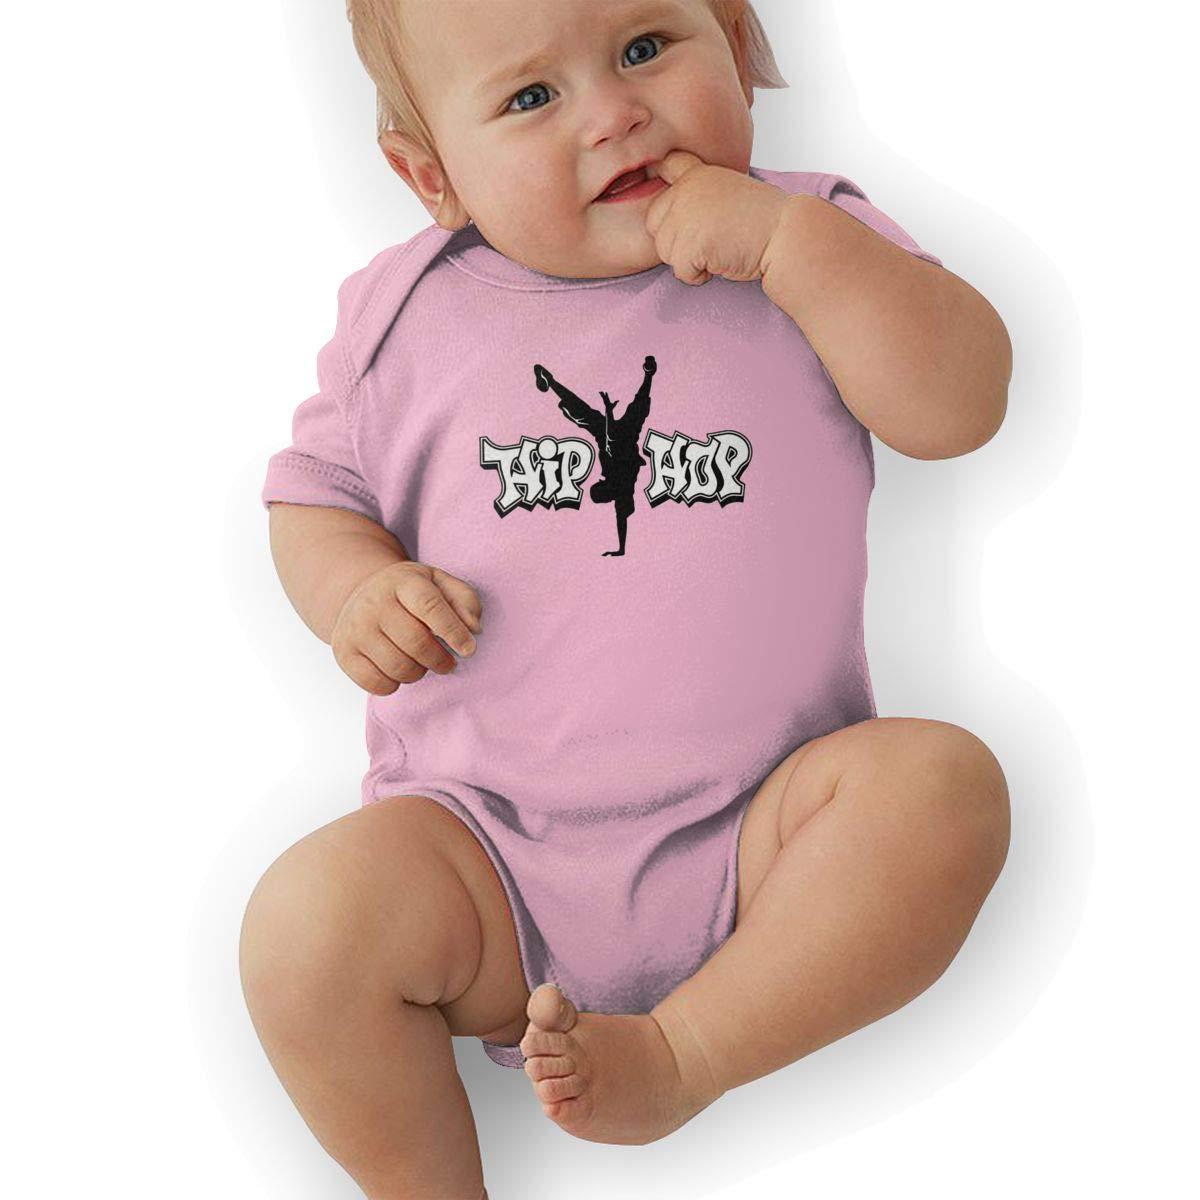 HappyLifea Hip Hop Newborn Baby Short Sleeve Romper Infant Summer Clothing